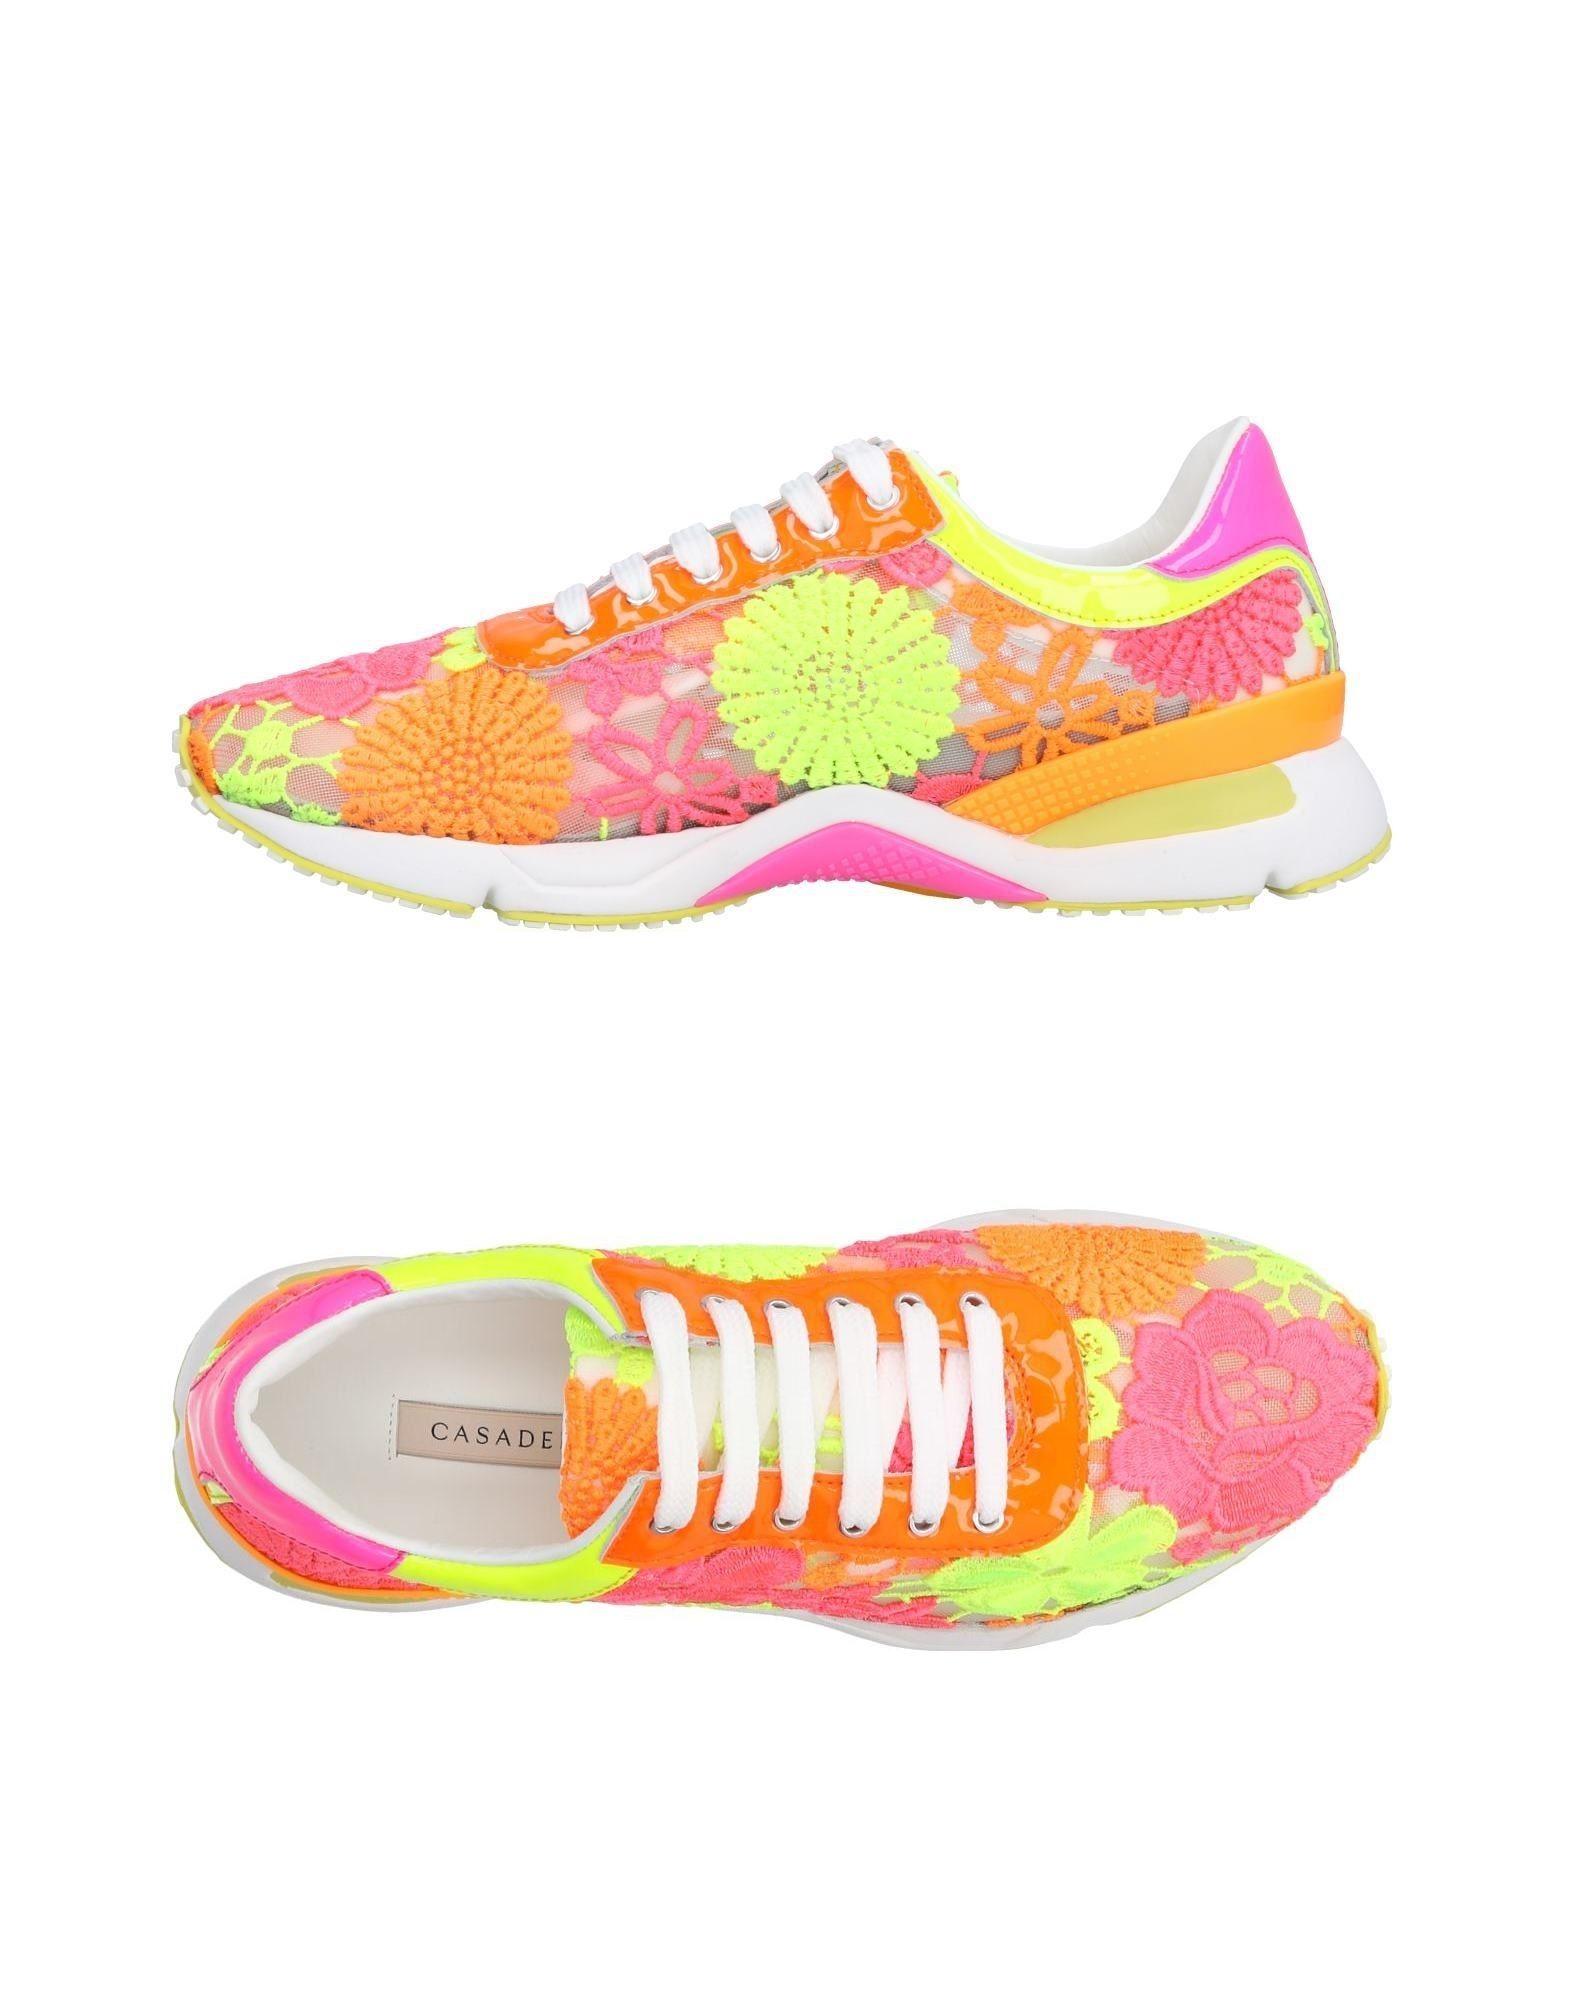 Rabatt Casadei Schuhe Casadei Rabatt Sneakers Damen  11500330ML a1cab9